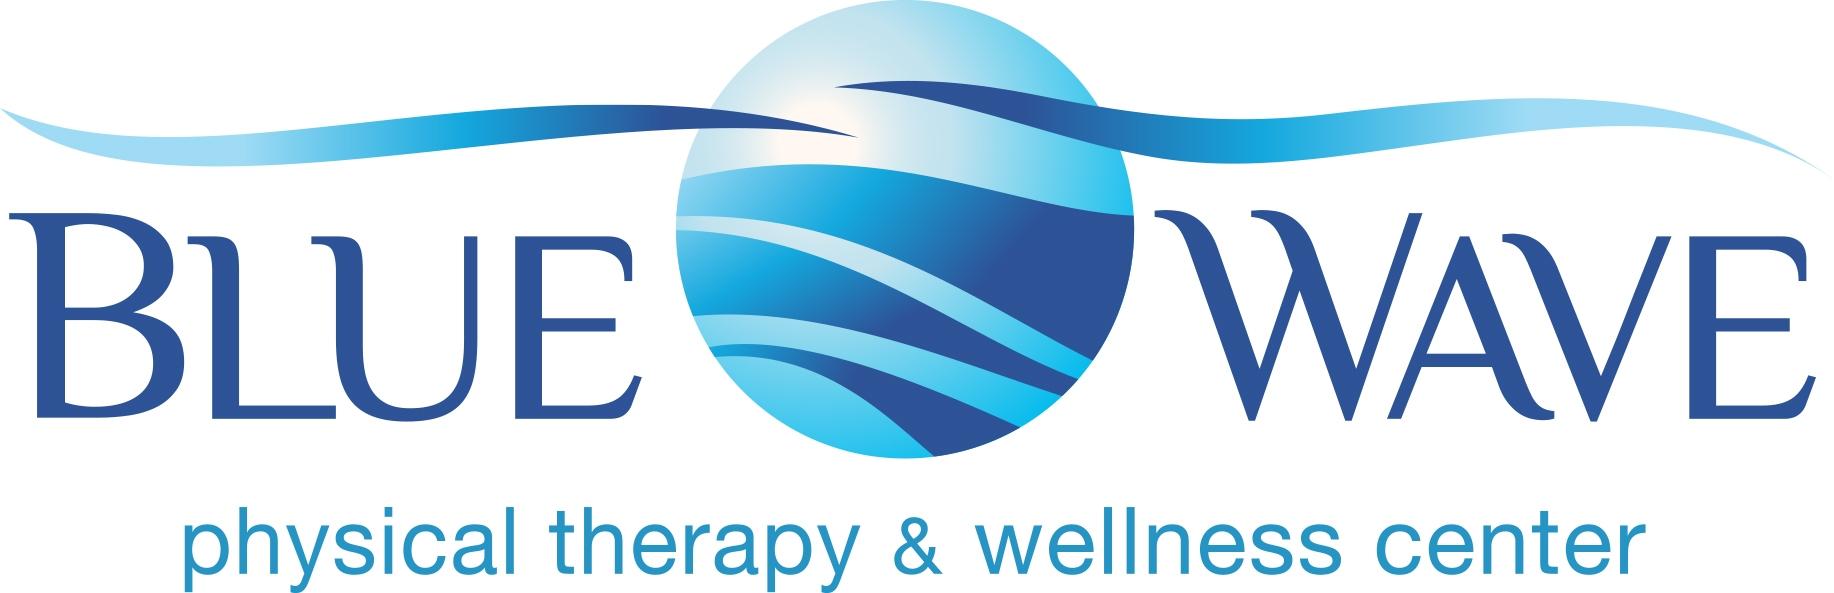 BLUEWAVE-logo.jpg